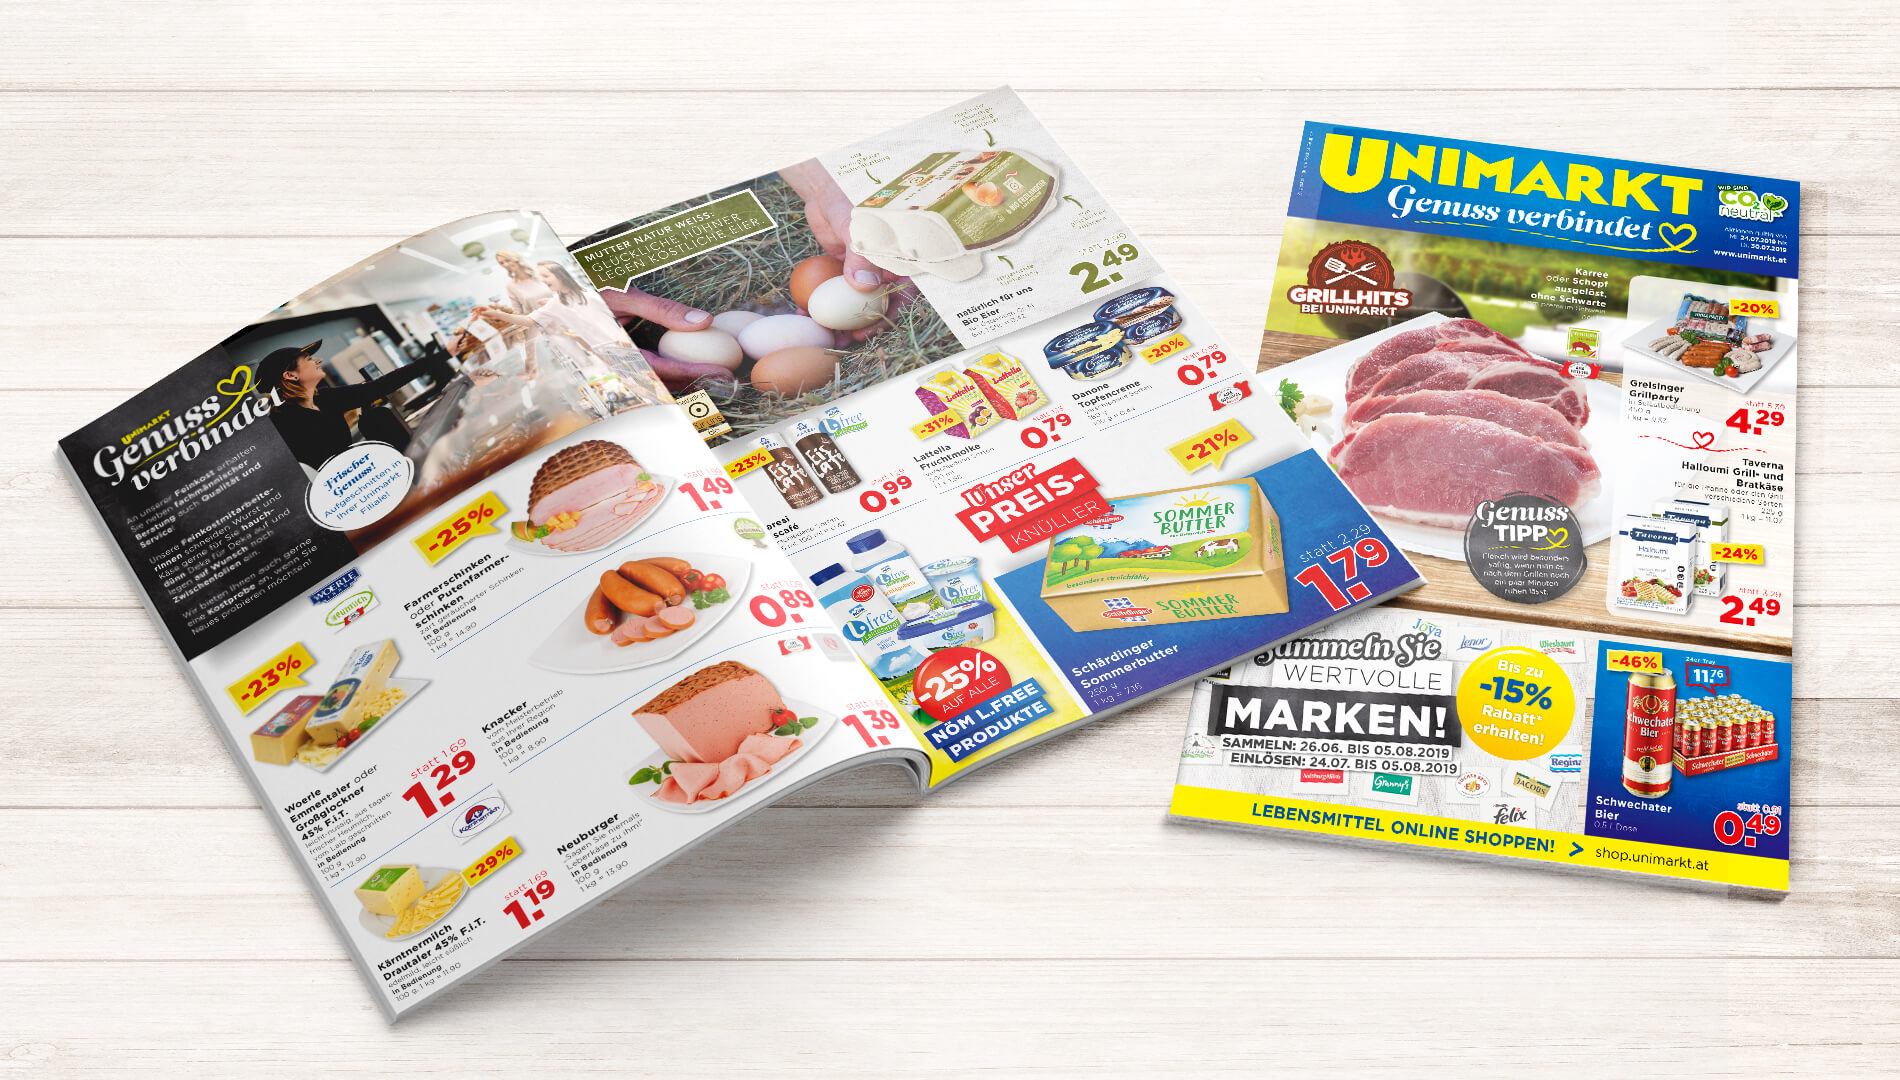 Unimarkt-bild-quer-flugblatt 2